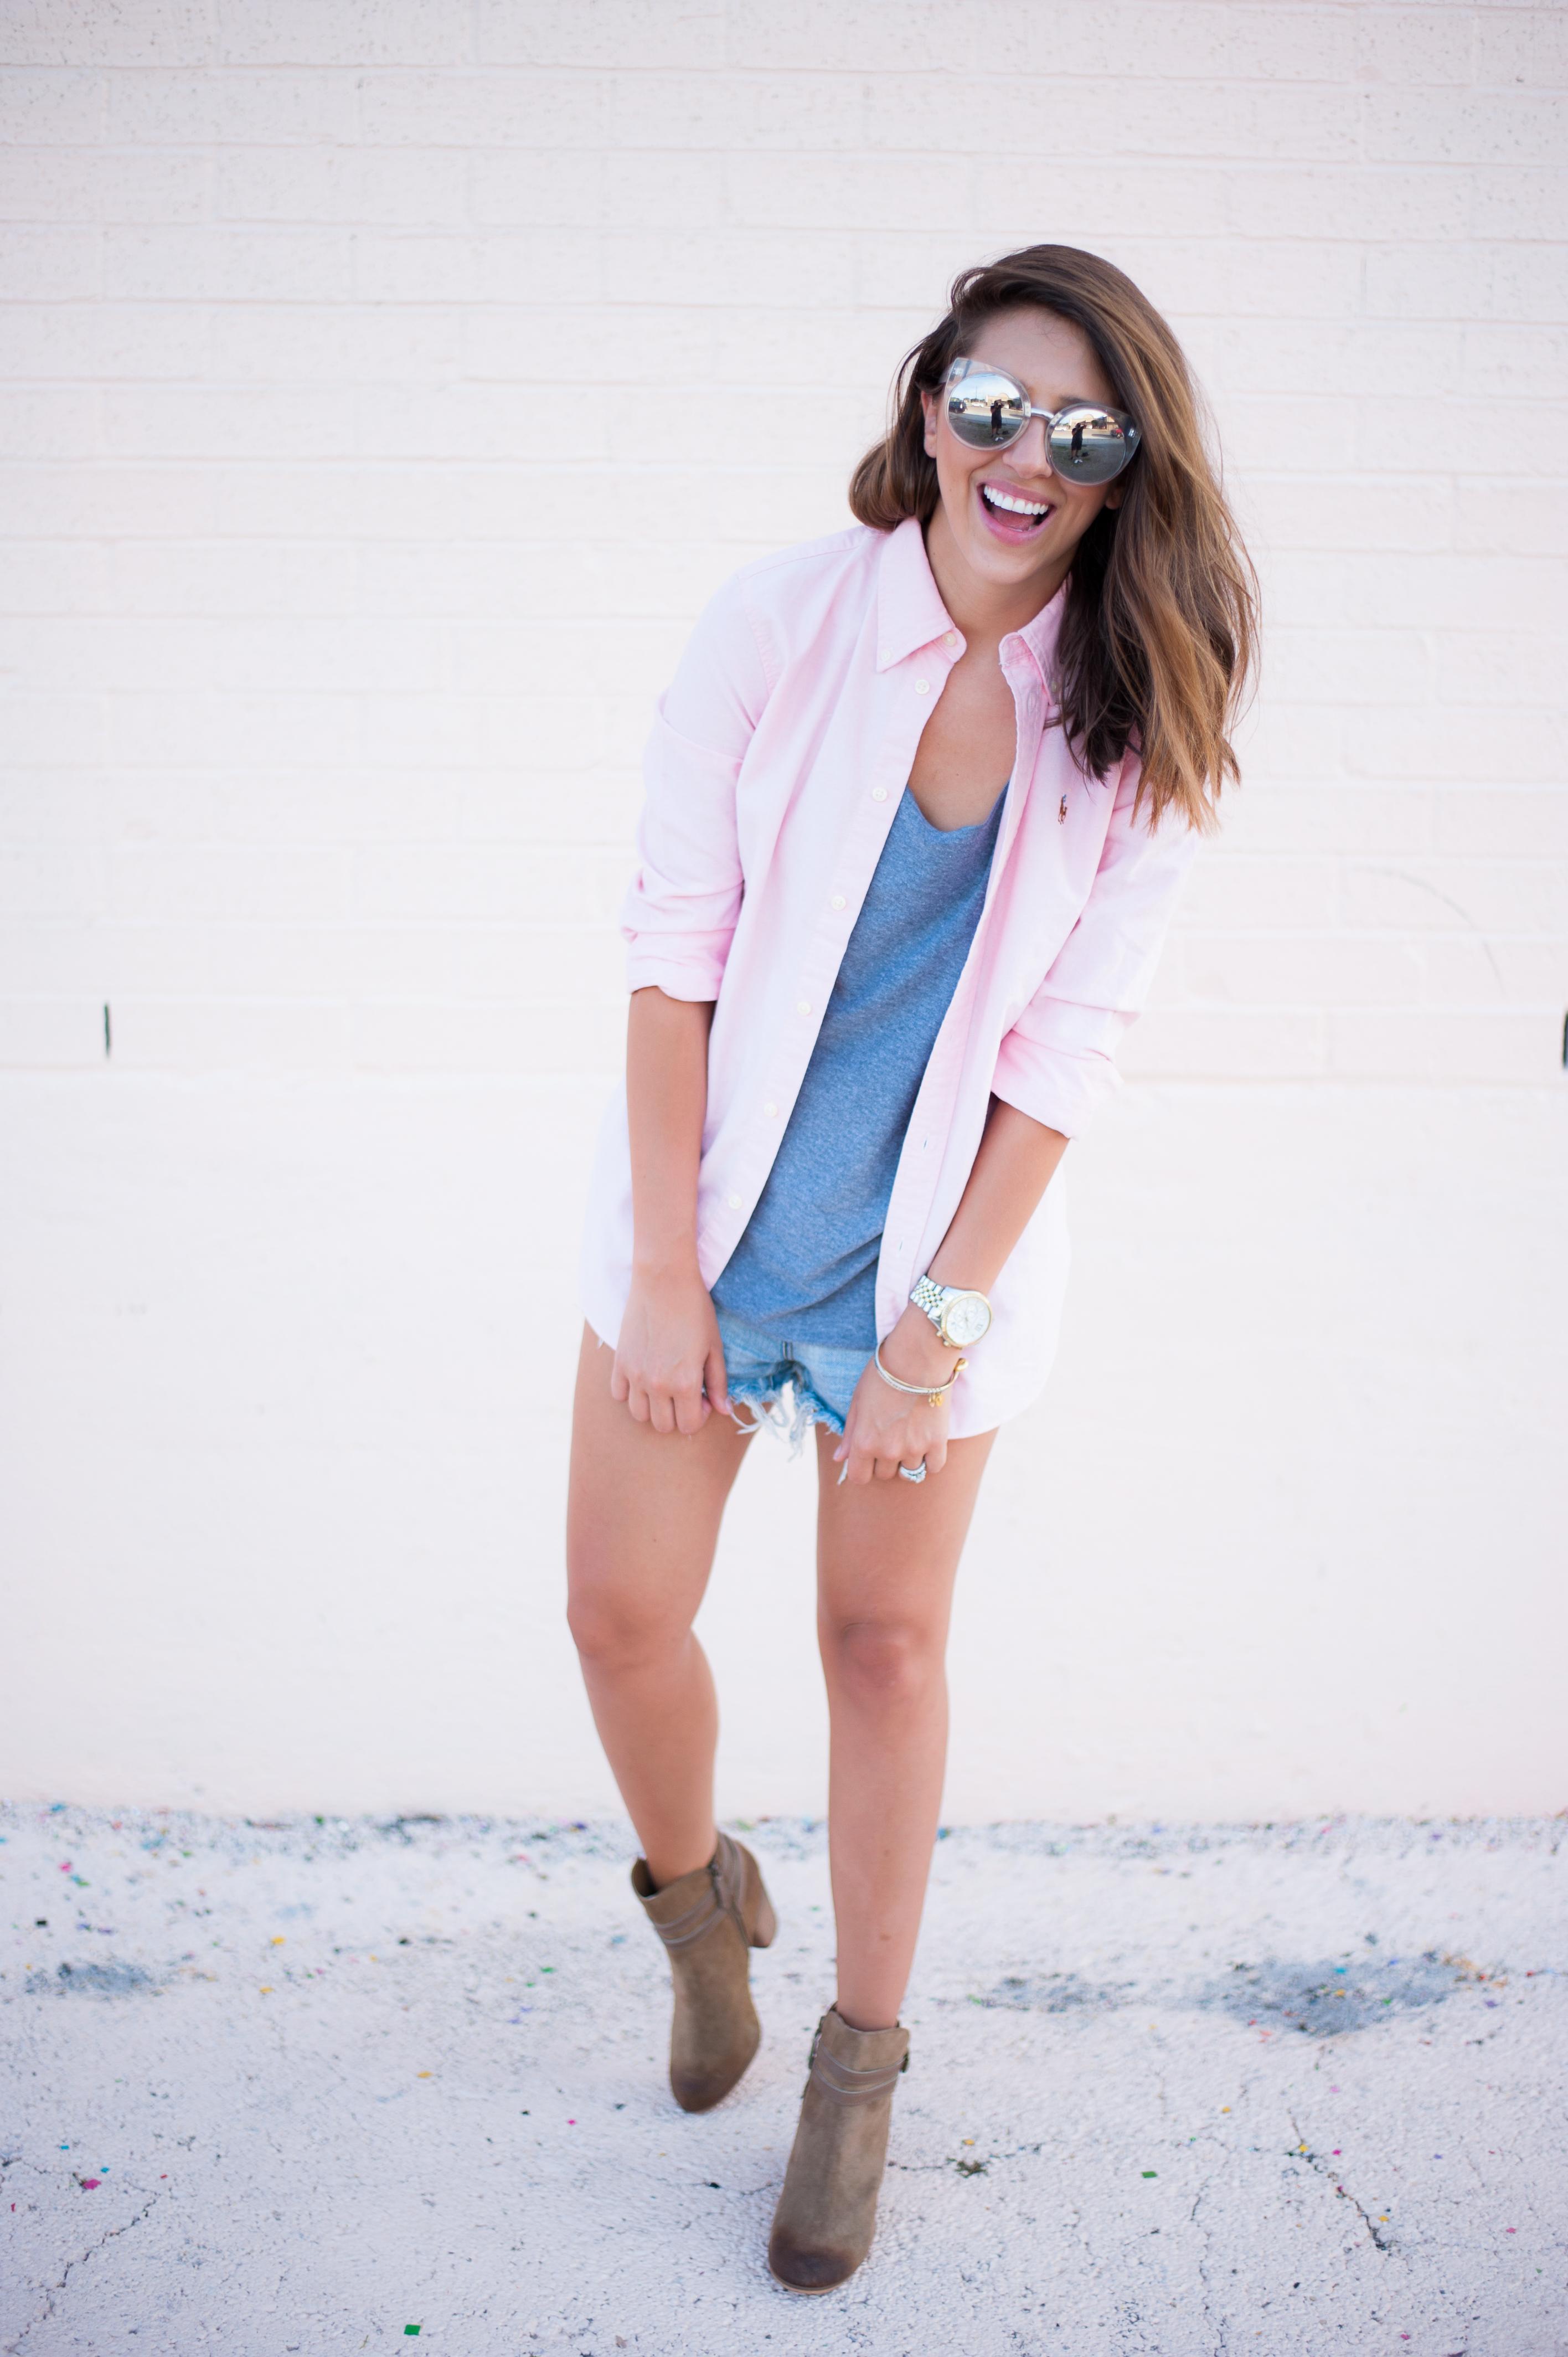 dress_up_buttercup_dede_raad_houston_fashion_fashion_blog (5 of 10)